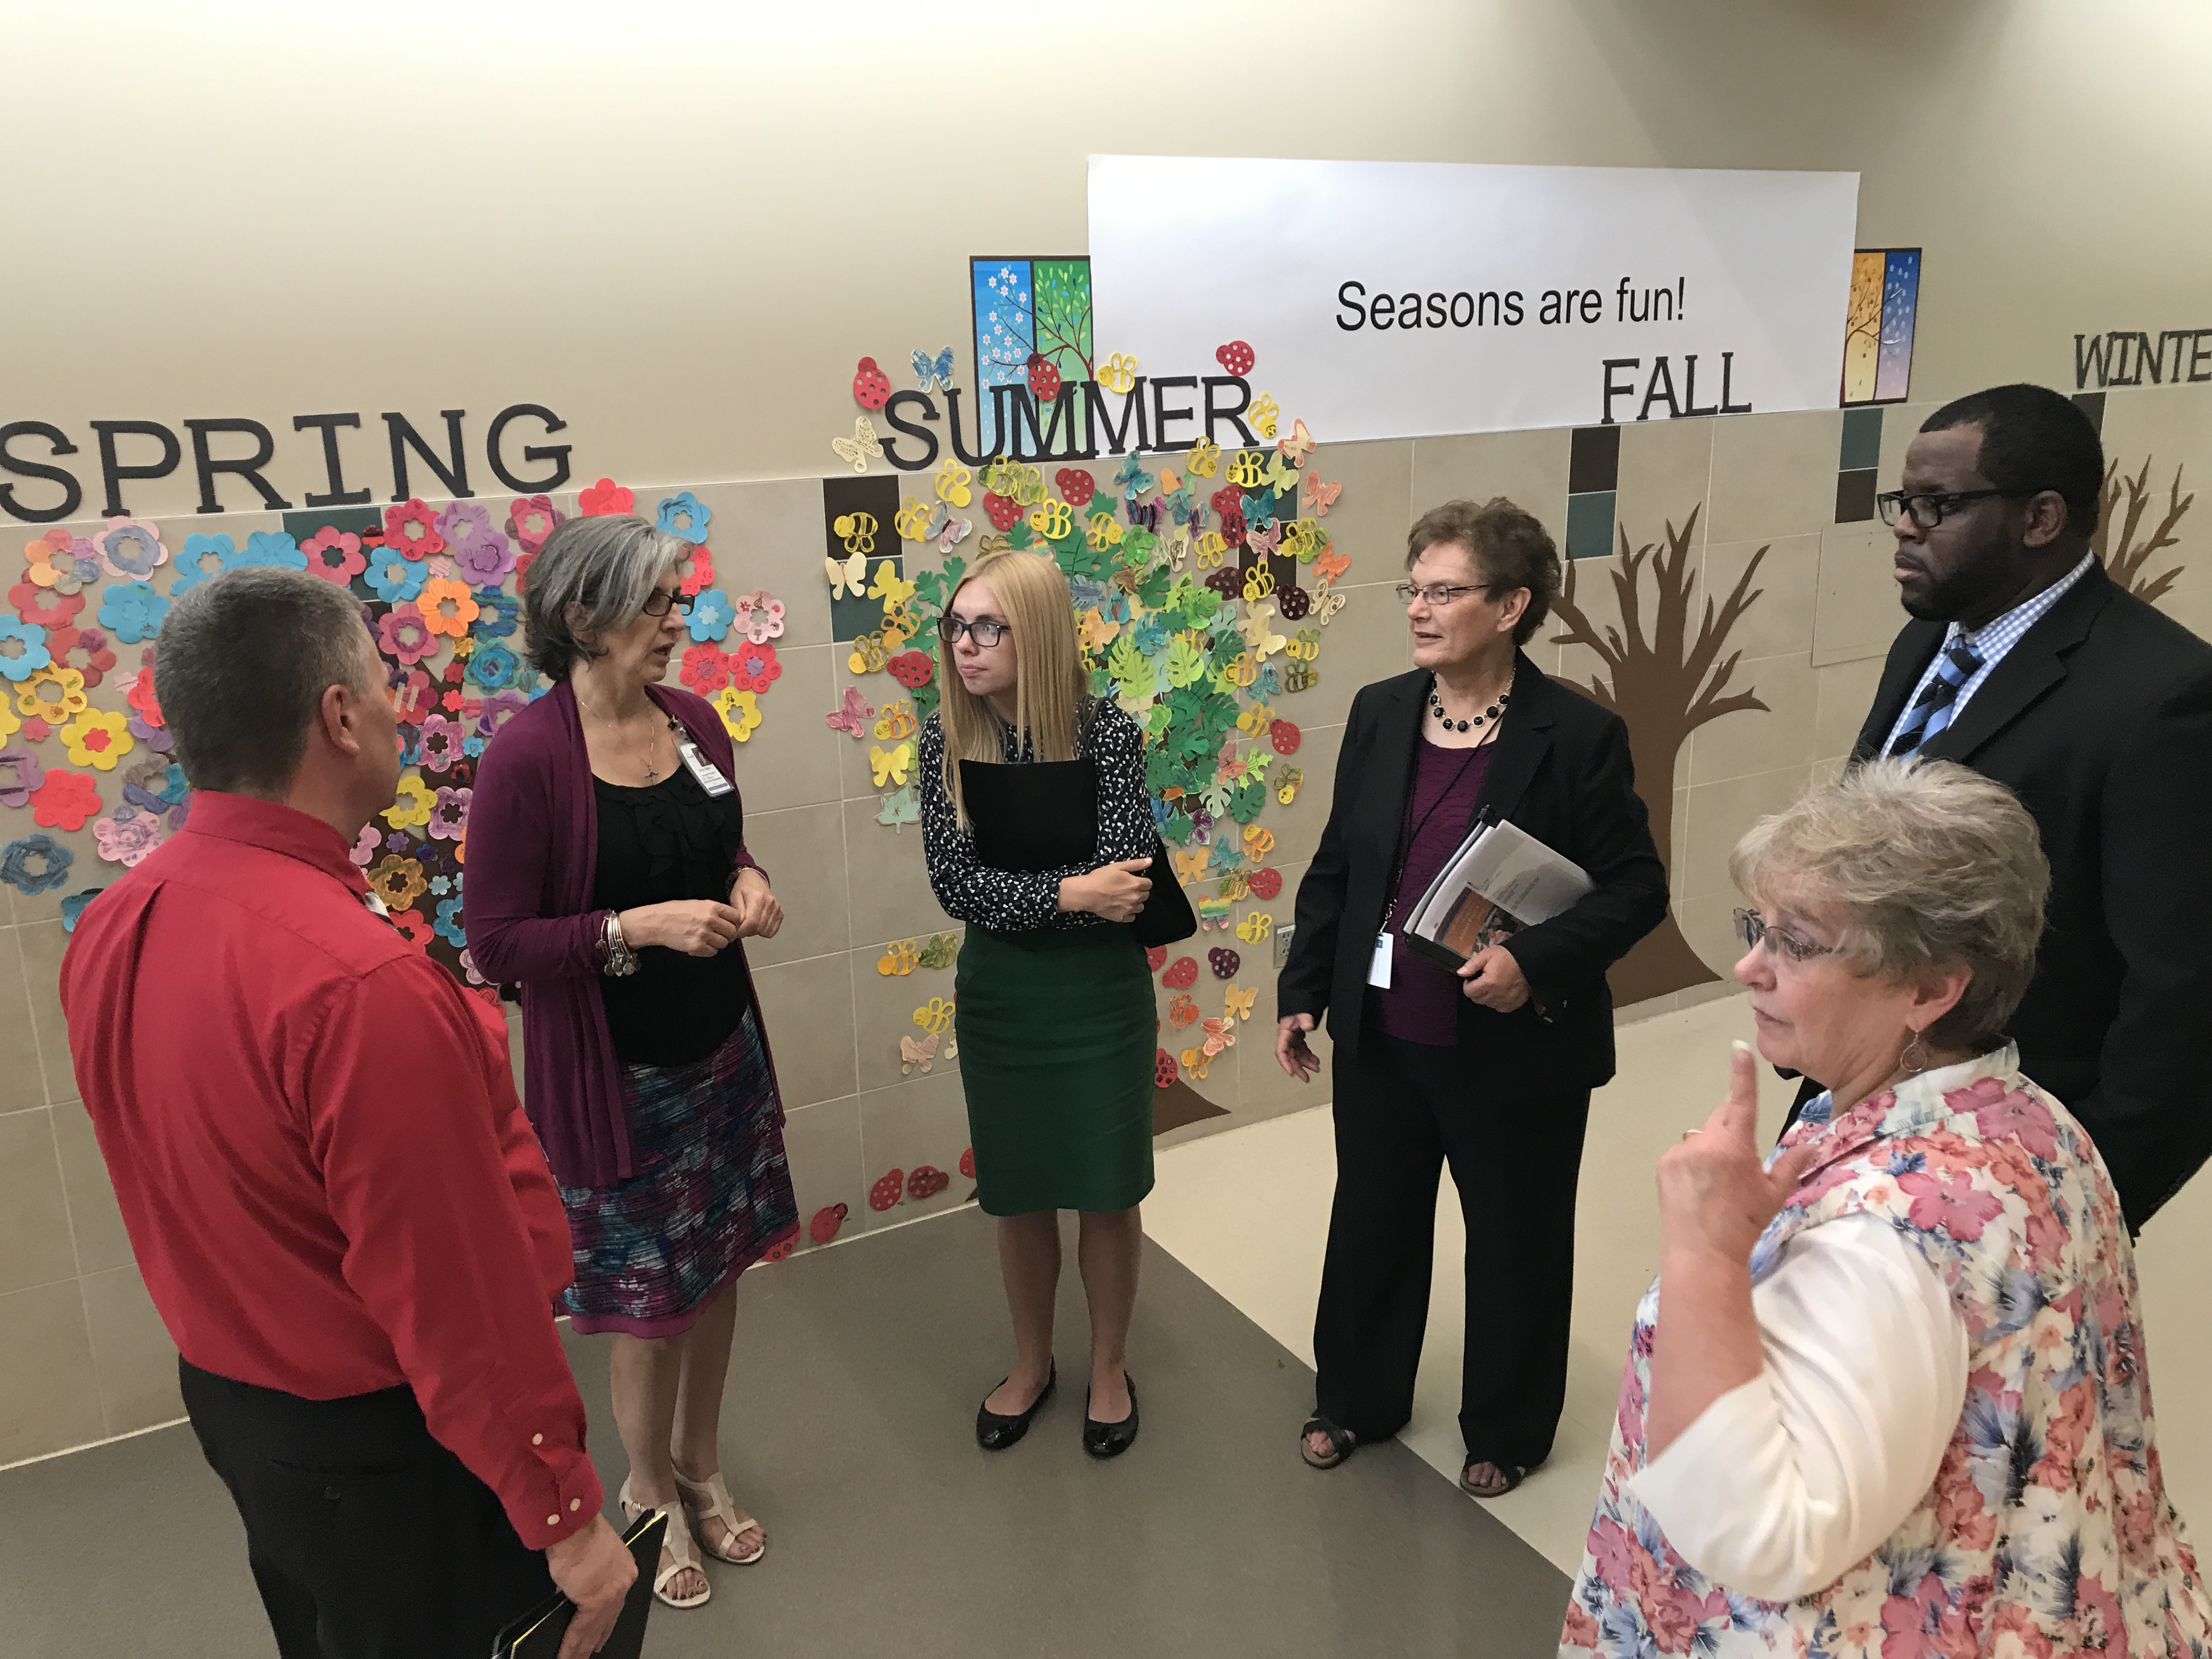 Senator Orin Hatch S Assistant Jessa Reed Visits Cep Programs June 8 Jessa reed is on facebook. community education partnership of west valley city